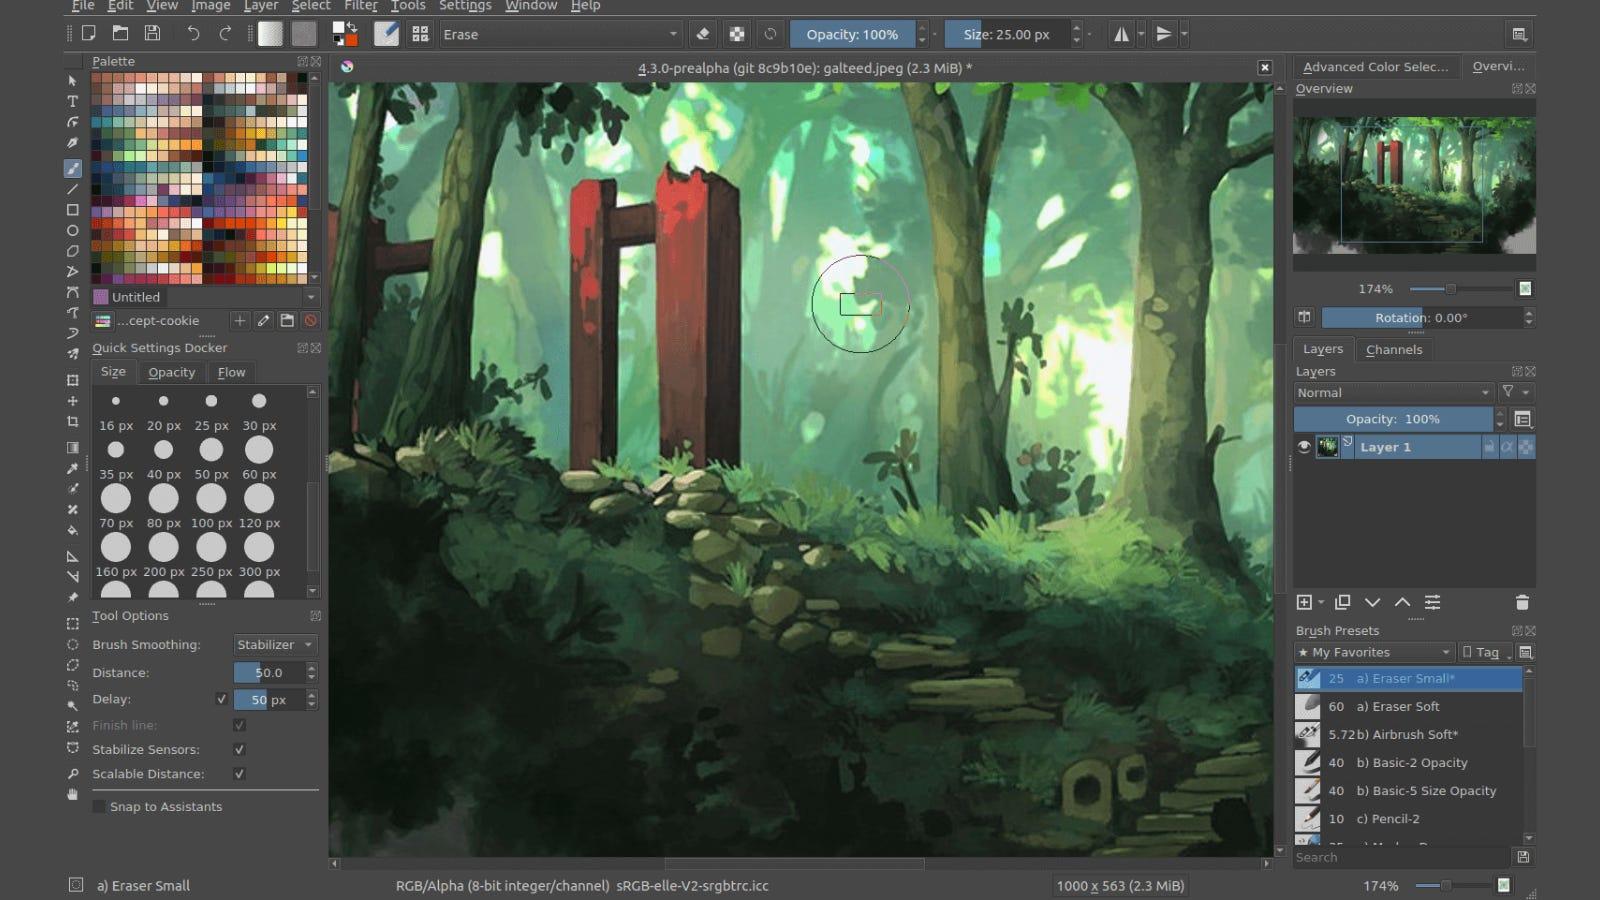 Main editing page of Krita digital drawing program